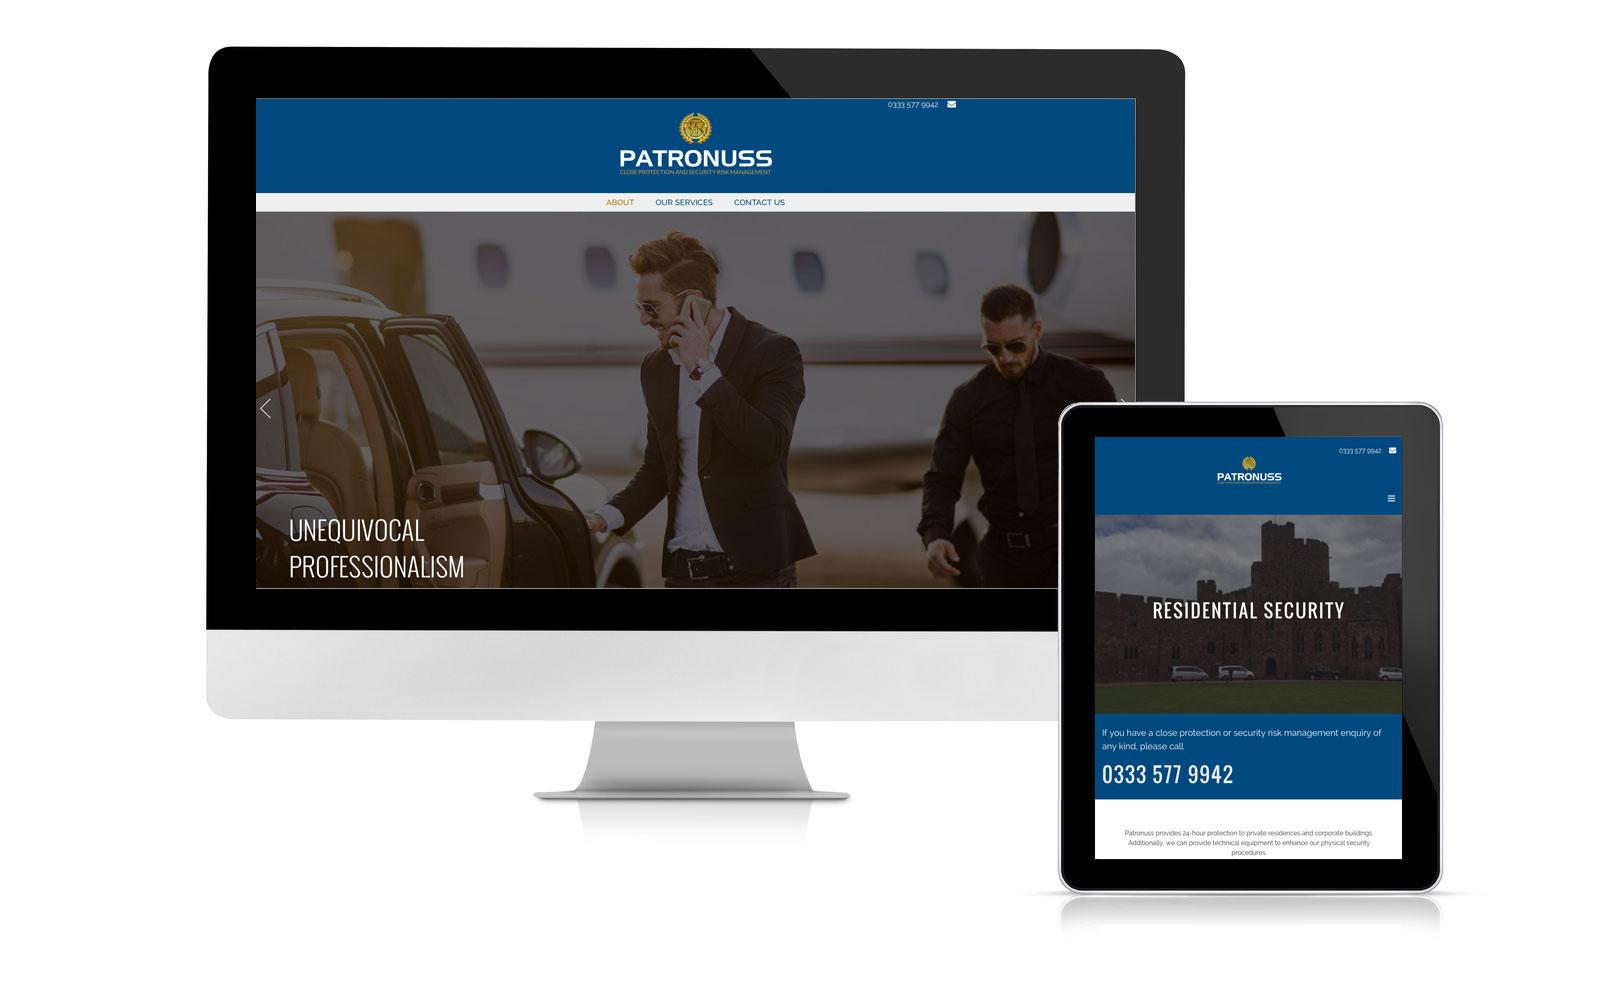 Patronuss website branding and marketing